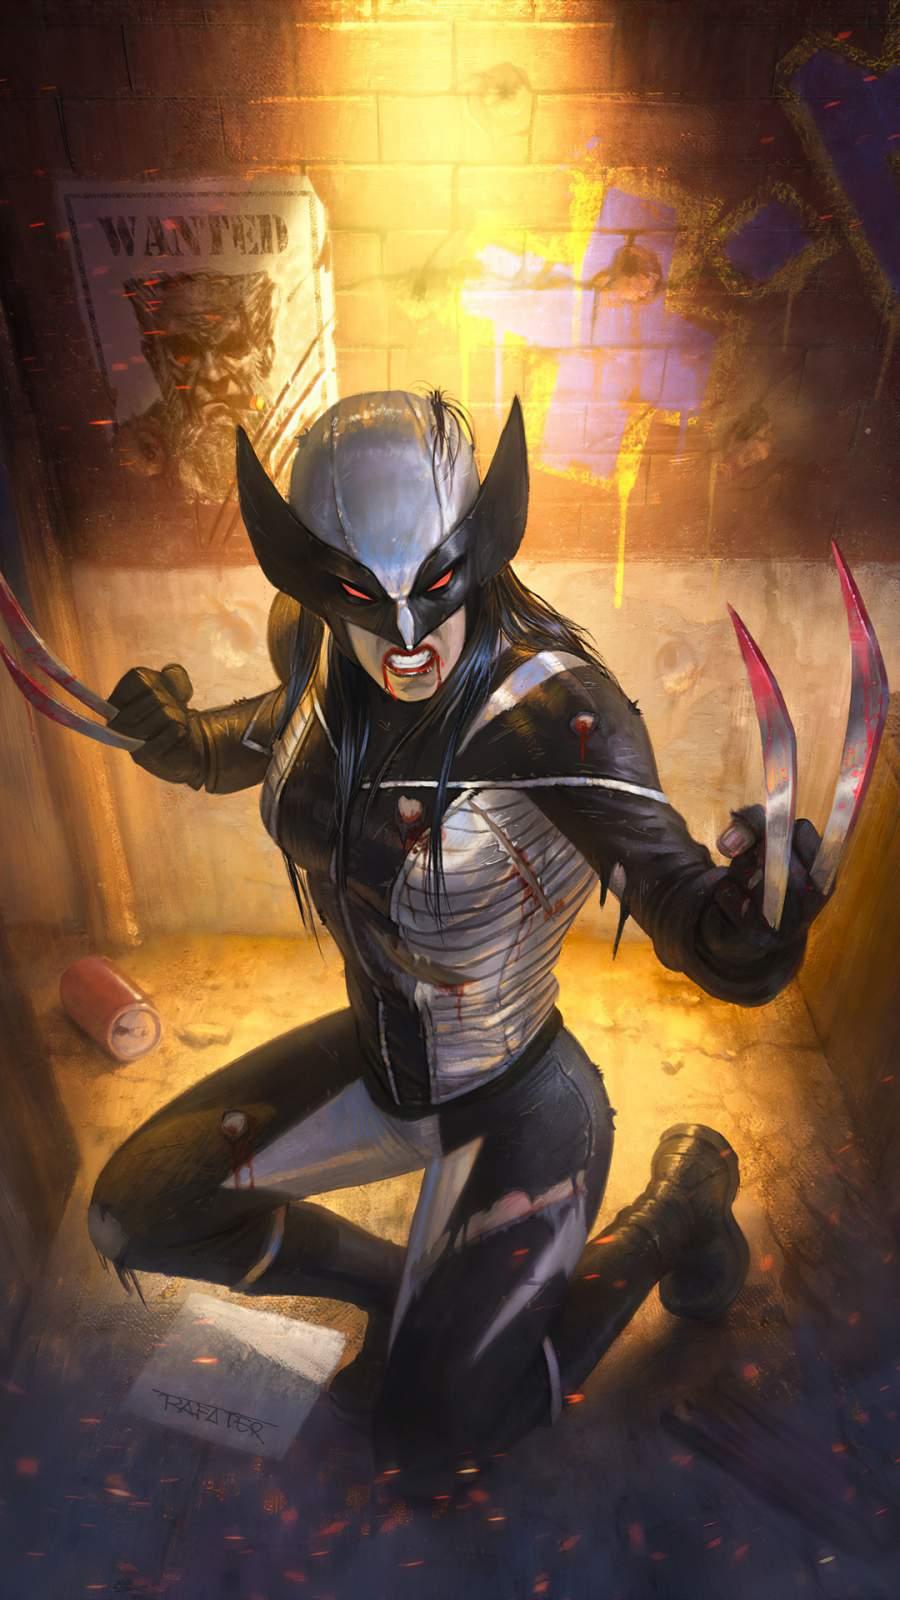 X23 Wolverine Artwork iPhone Wallpaper